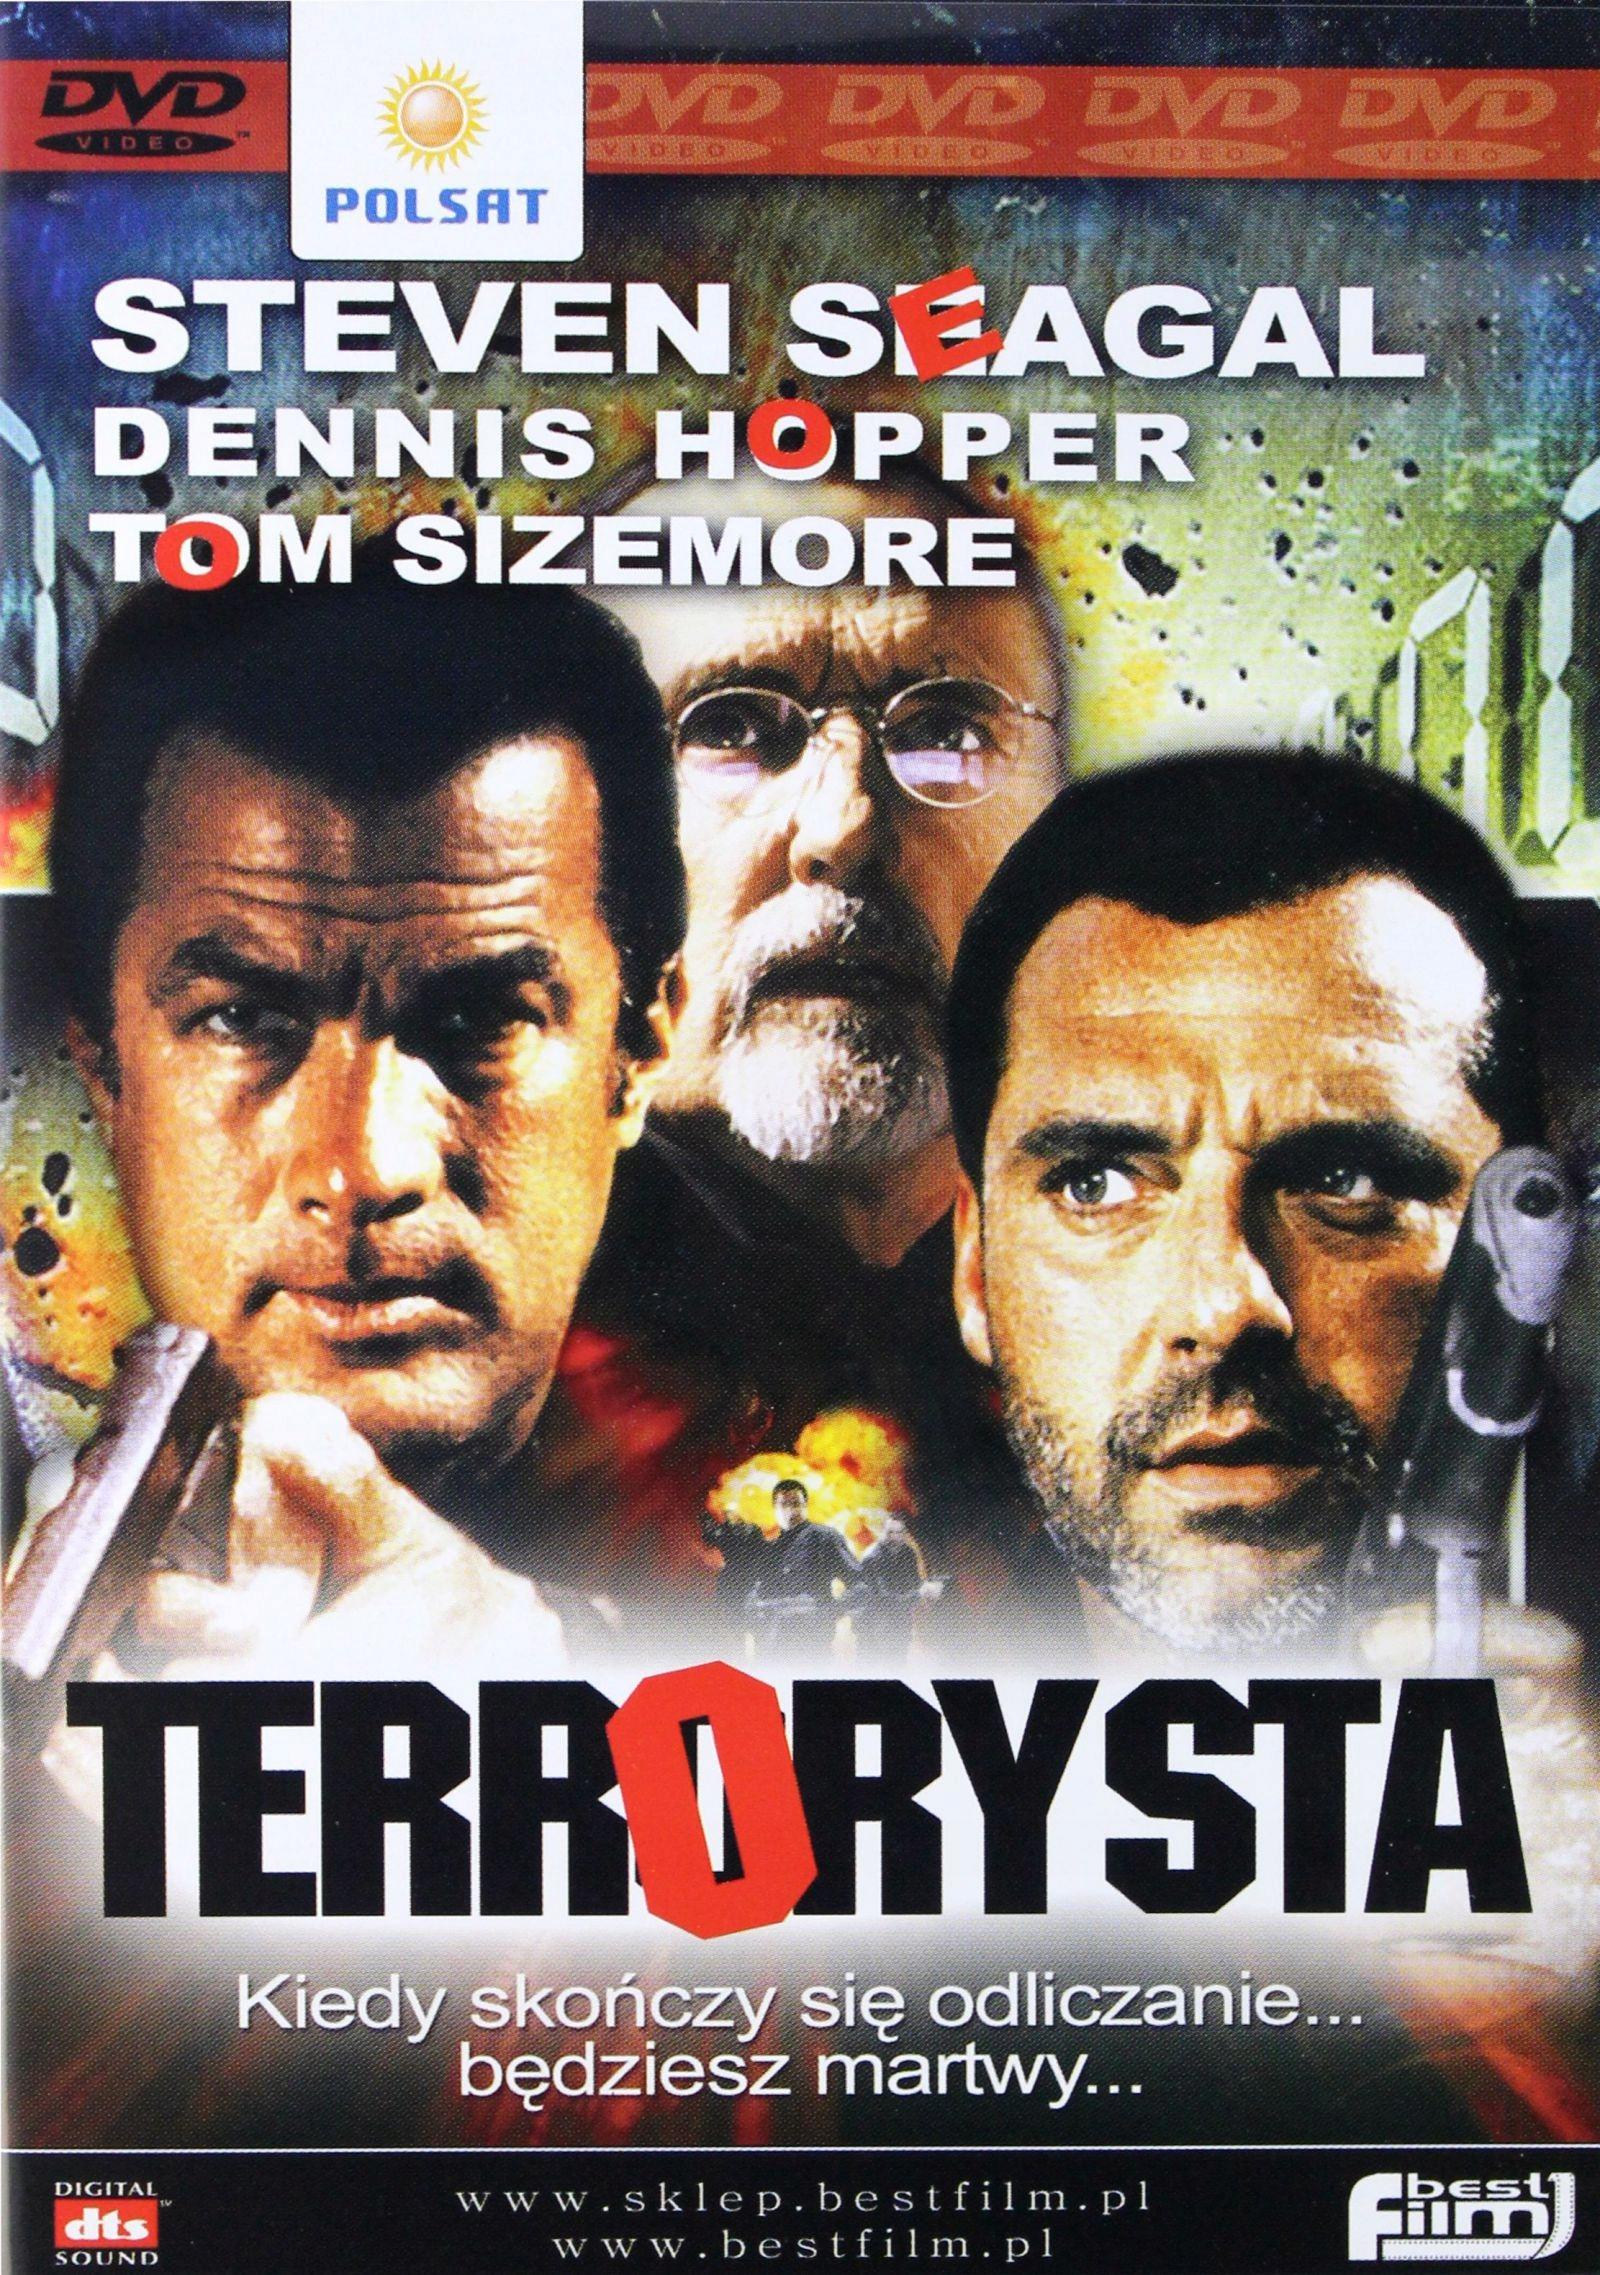 Terrorysta [Steven Seagal] polski Lektor [DVD]